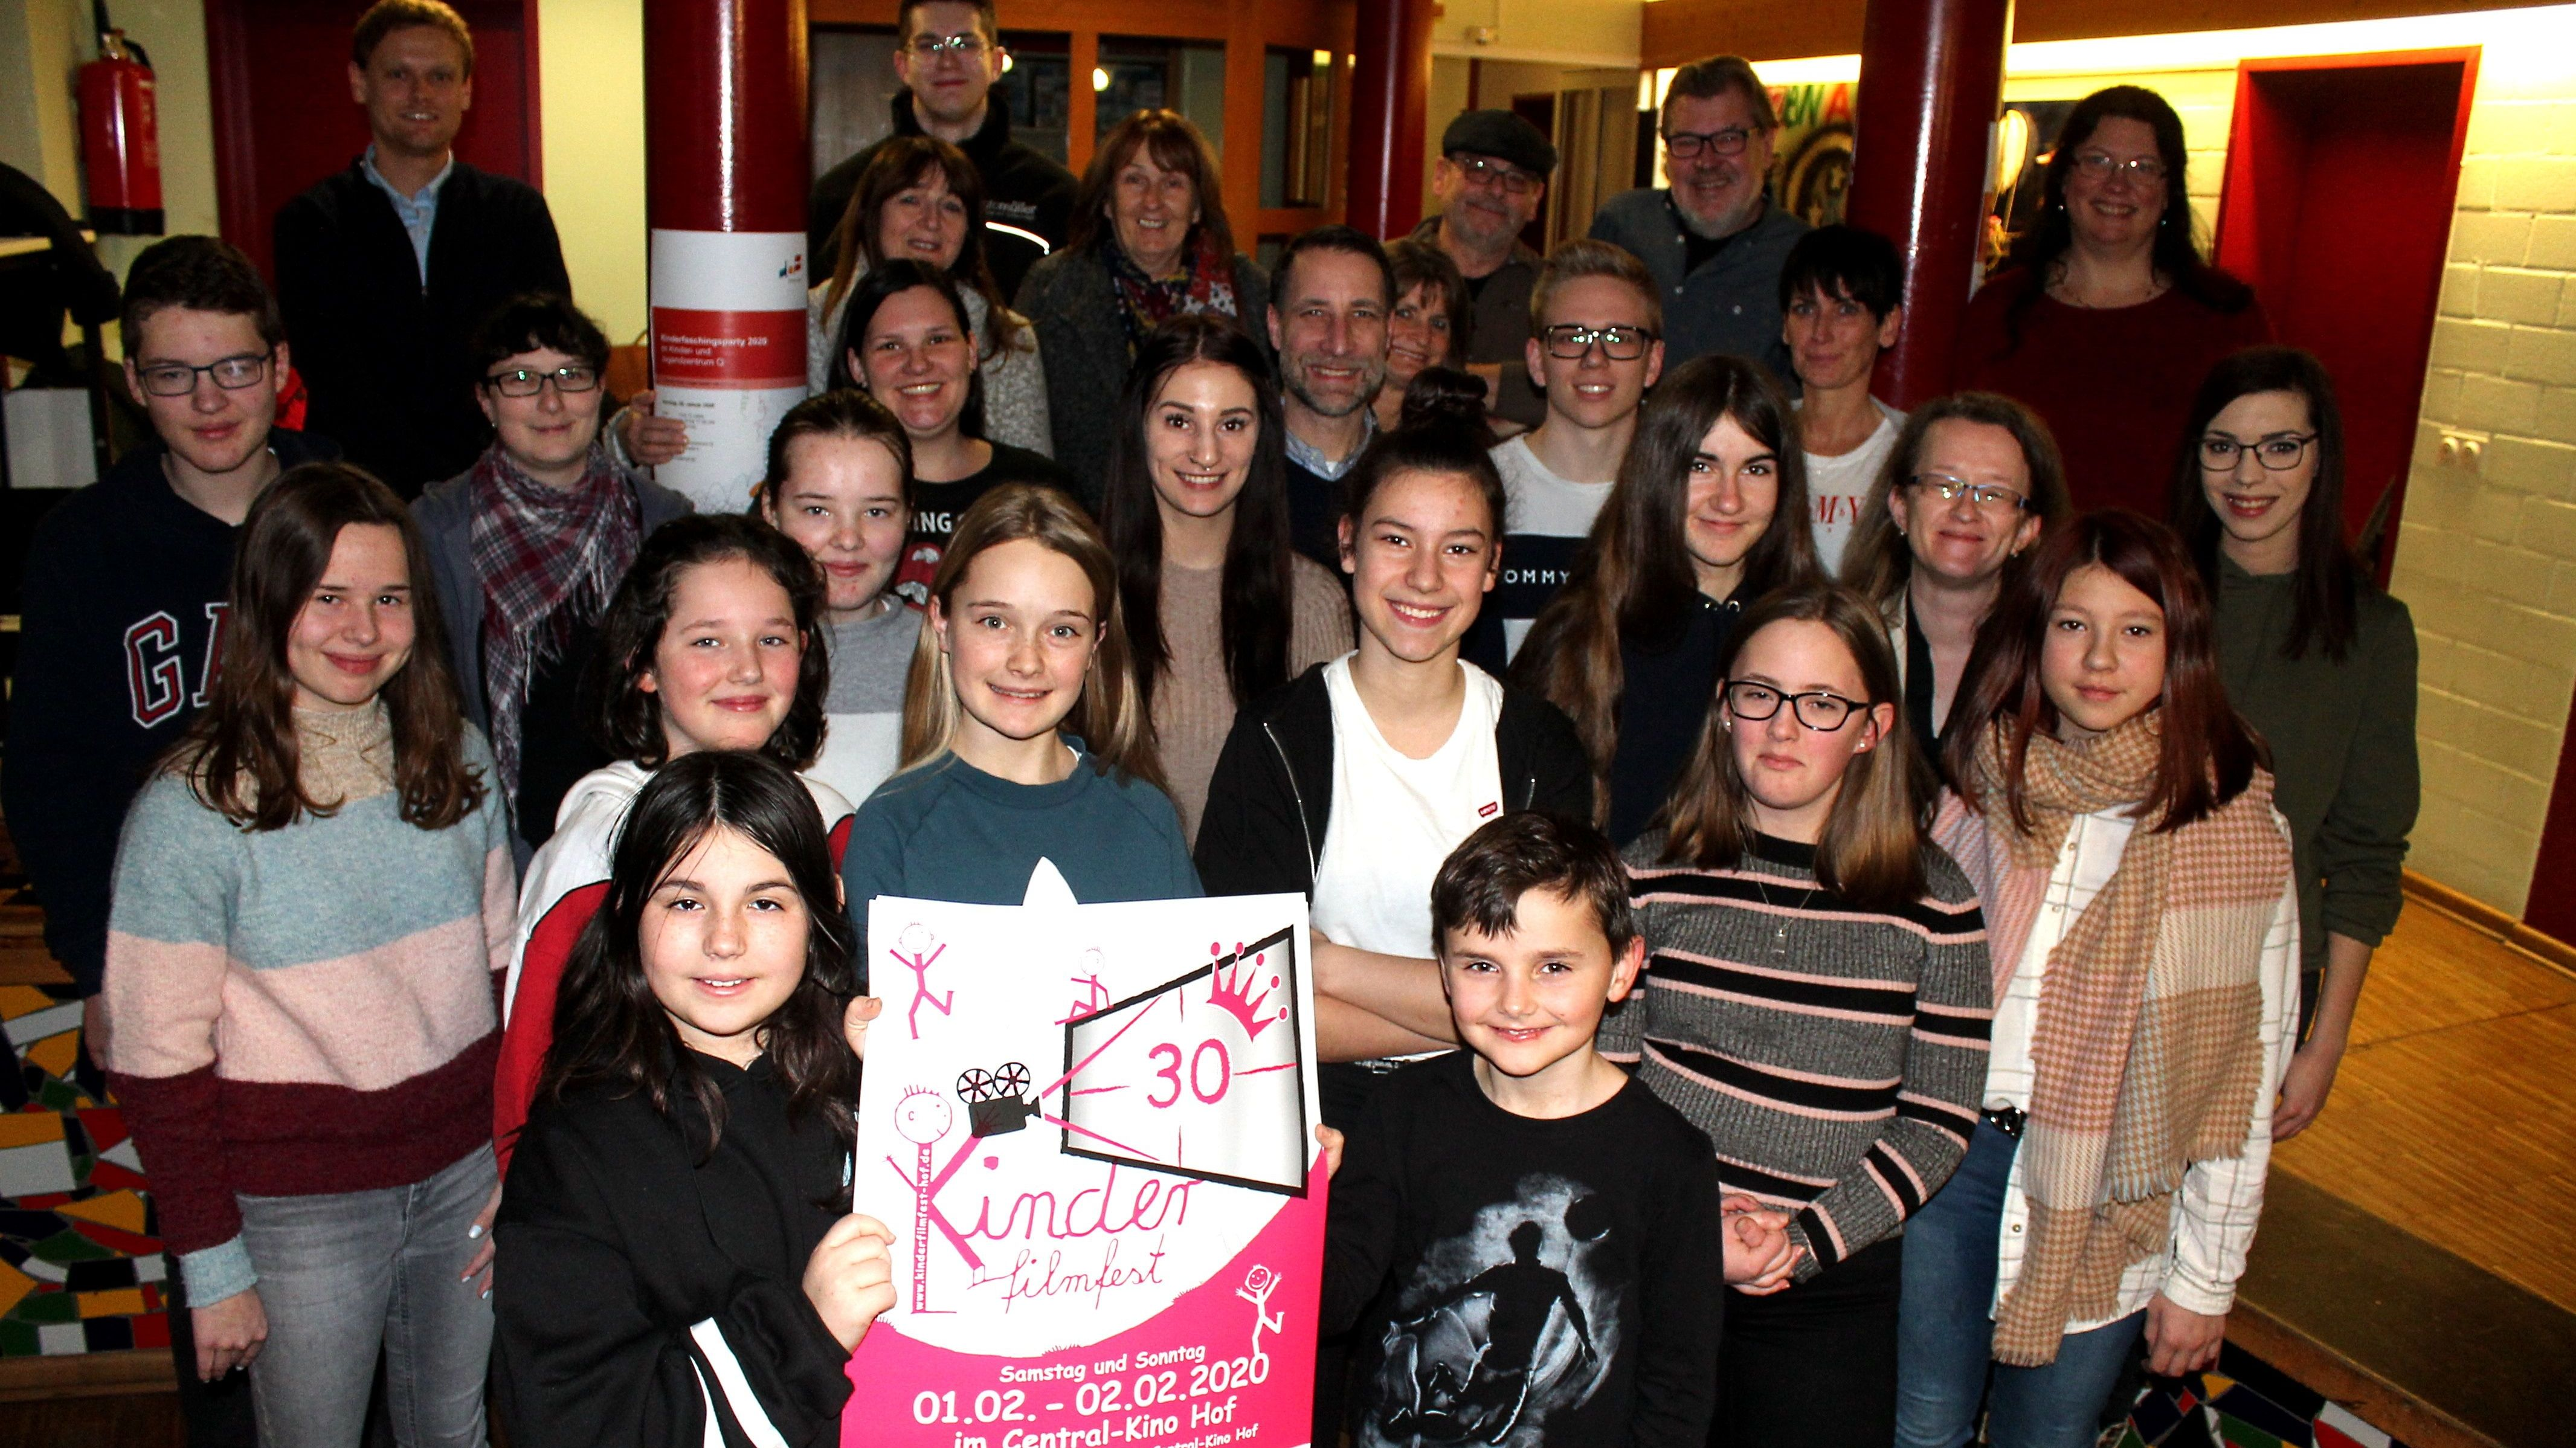 Gruppenbild des Kinderfilmfest-Teams.